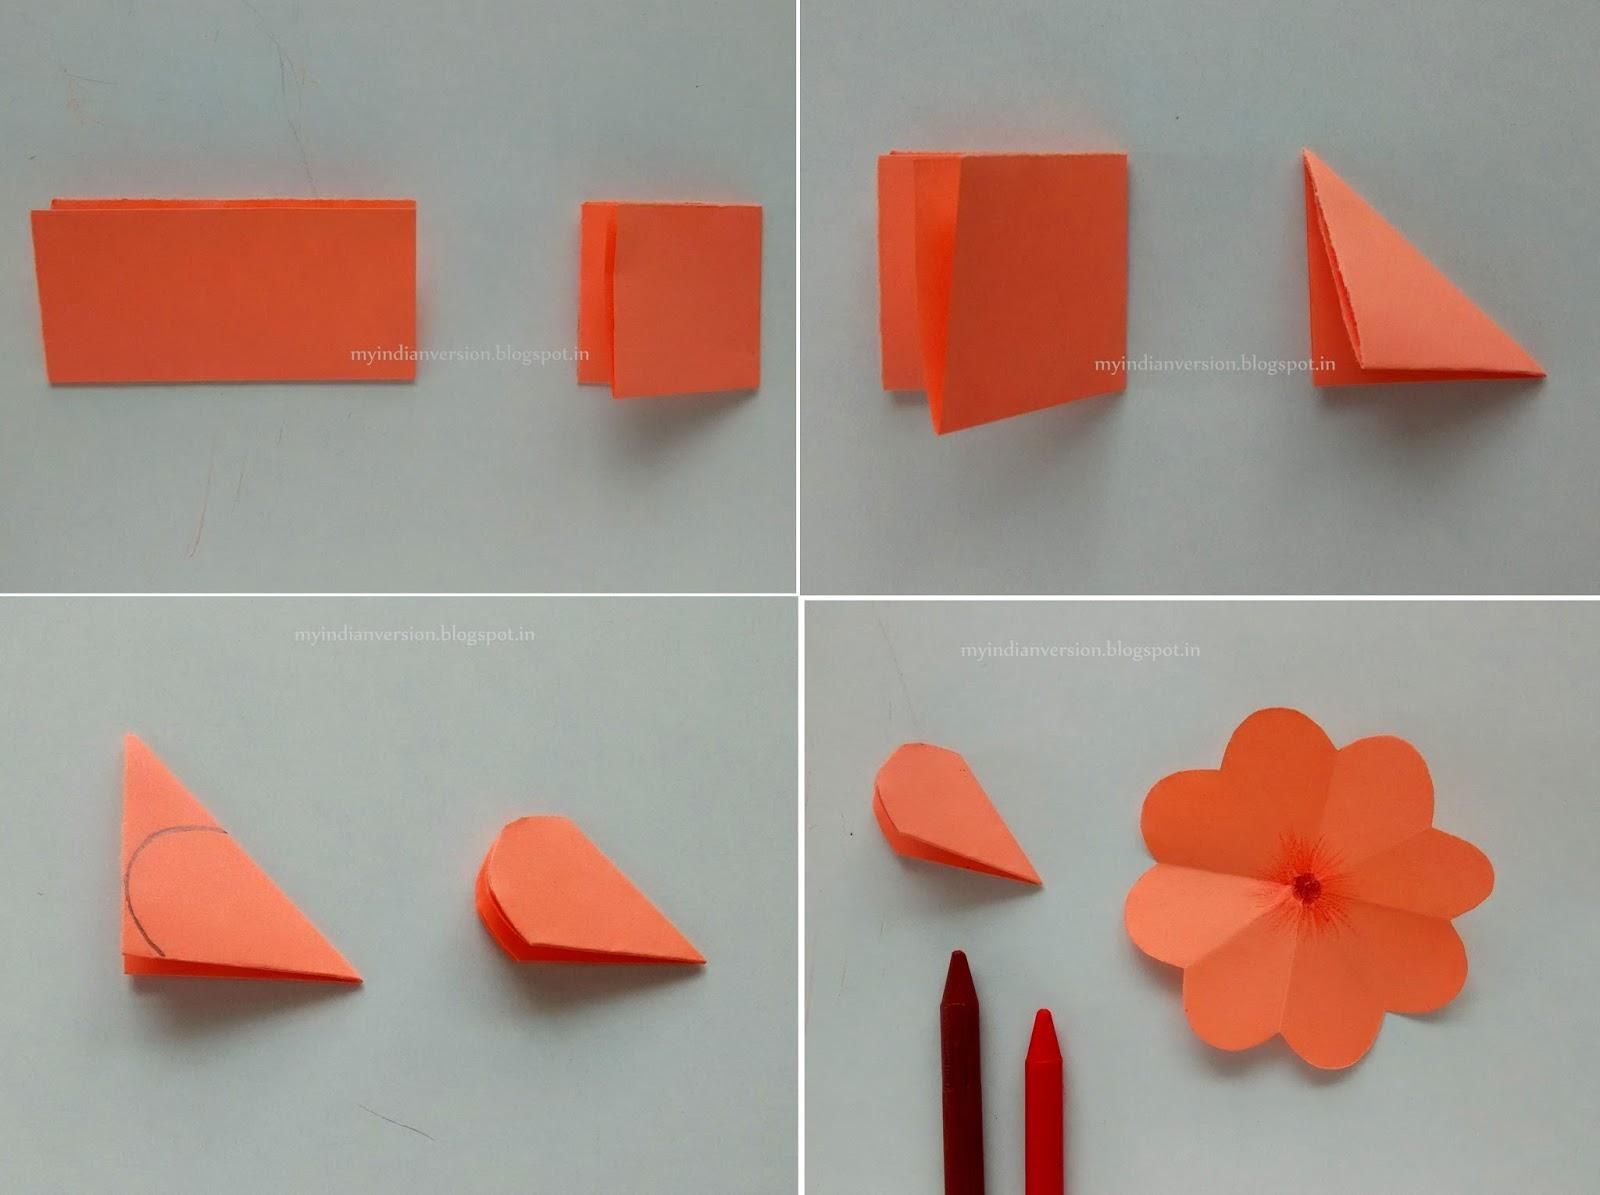 Diy Easy Pop Up Card Photo Tutorial Diy Pop Up Cards Pop Up Flower Cards Birthday Cards Diy